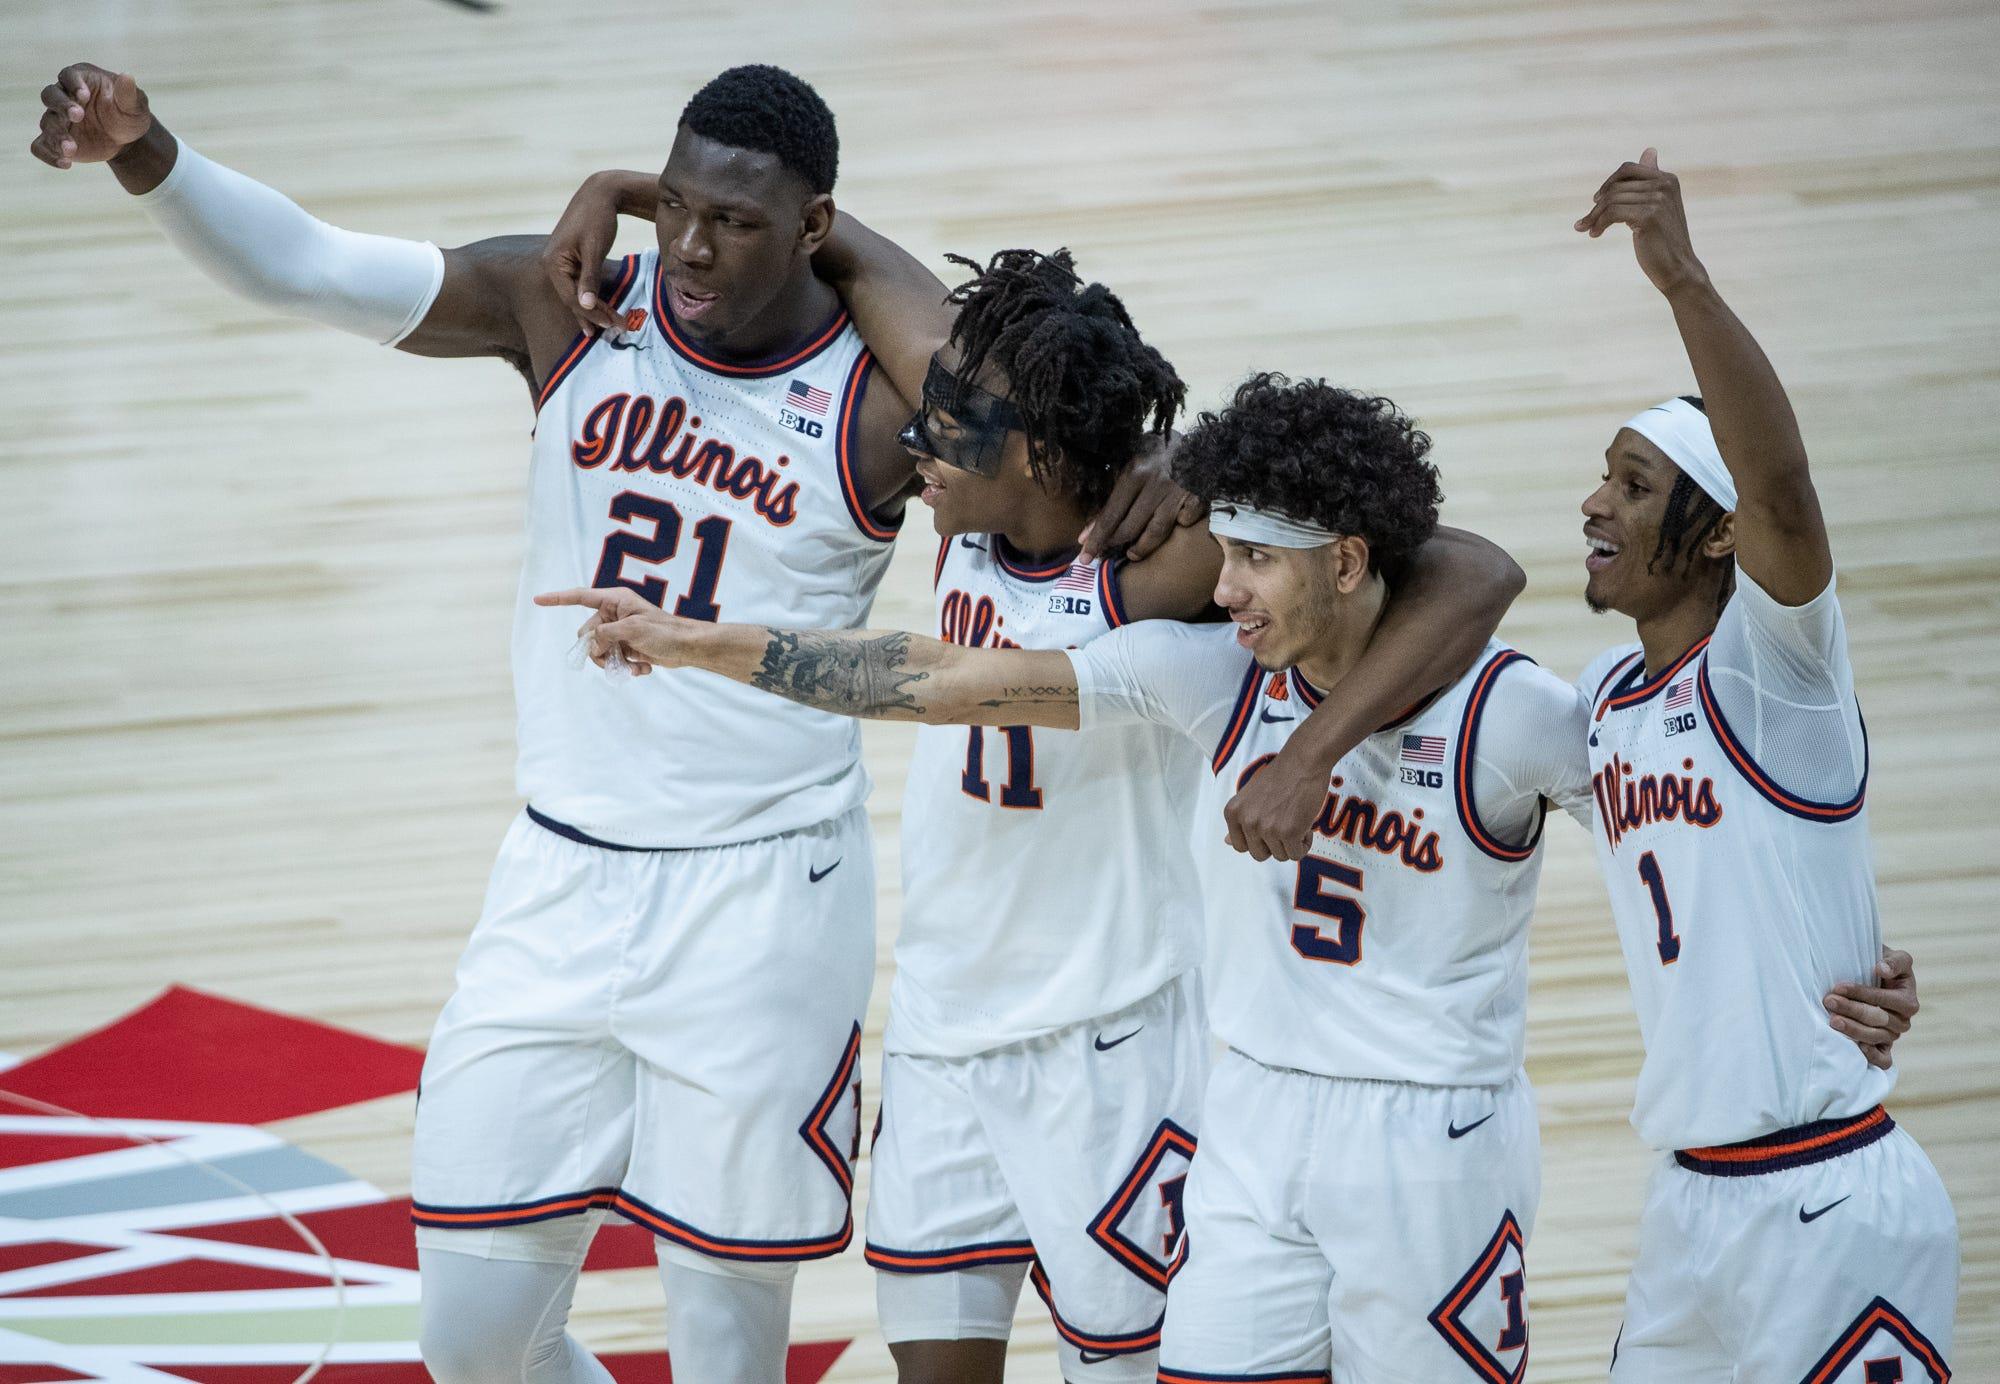 Basketball Recruits Taking Notice of Illini's Success